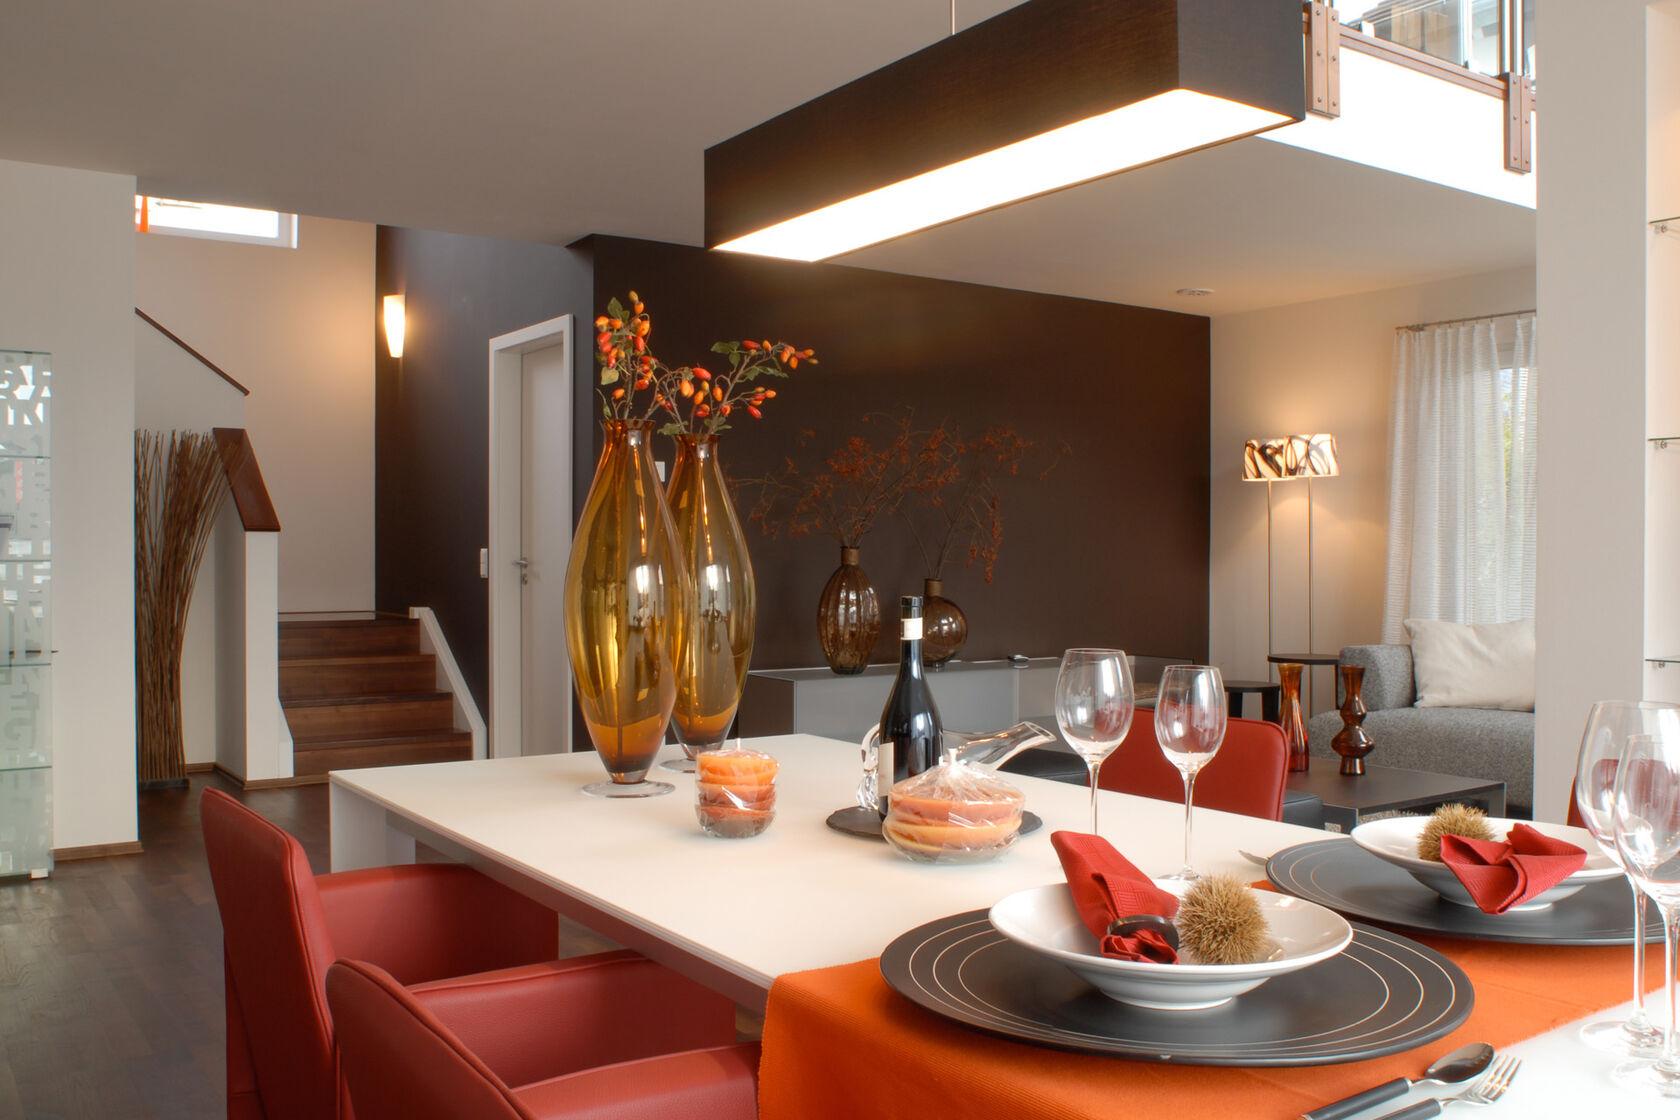 haas fertigbau gmbh home expo suhr. Black Bedroom Furniture Sets. Home Design Ideas